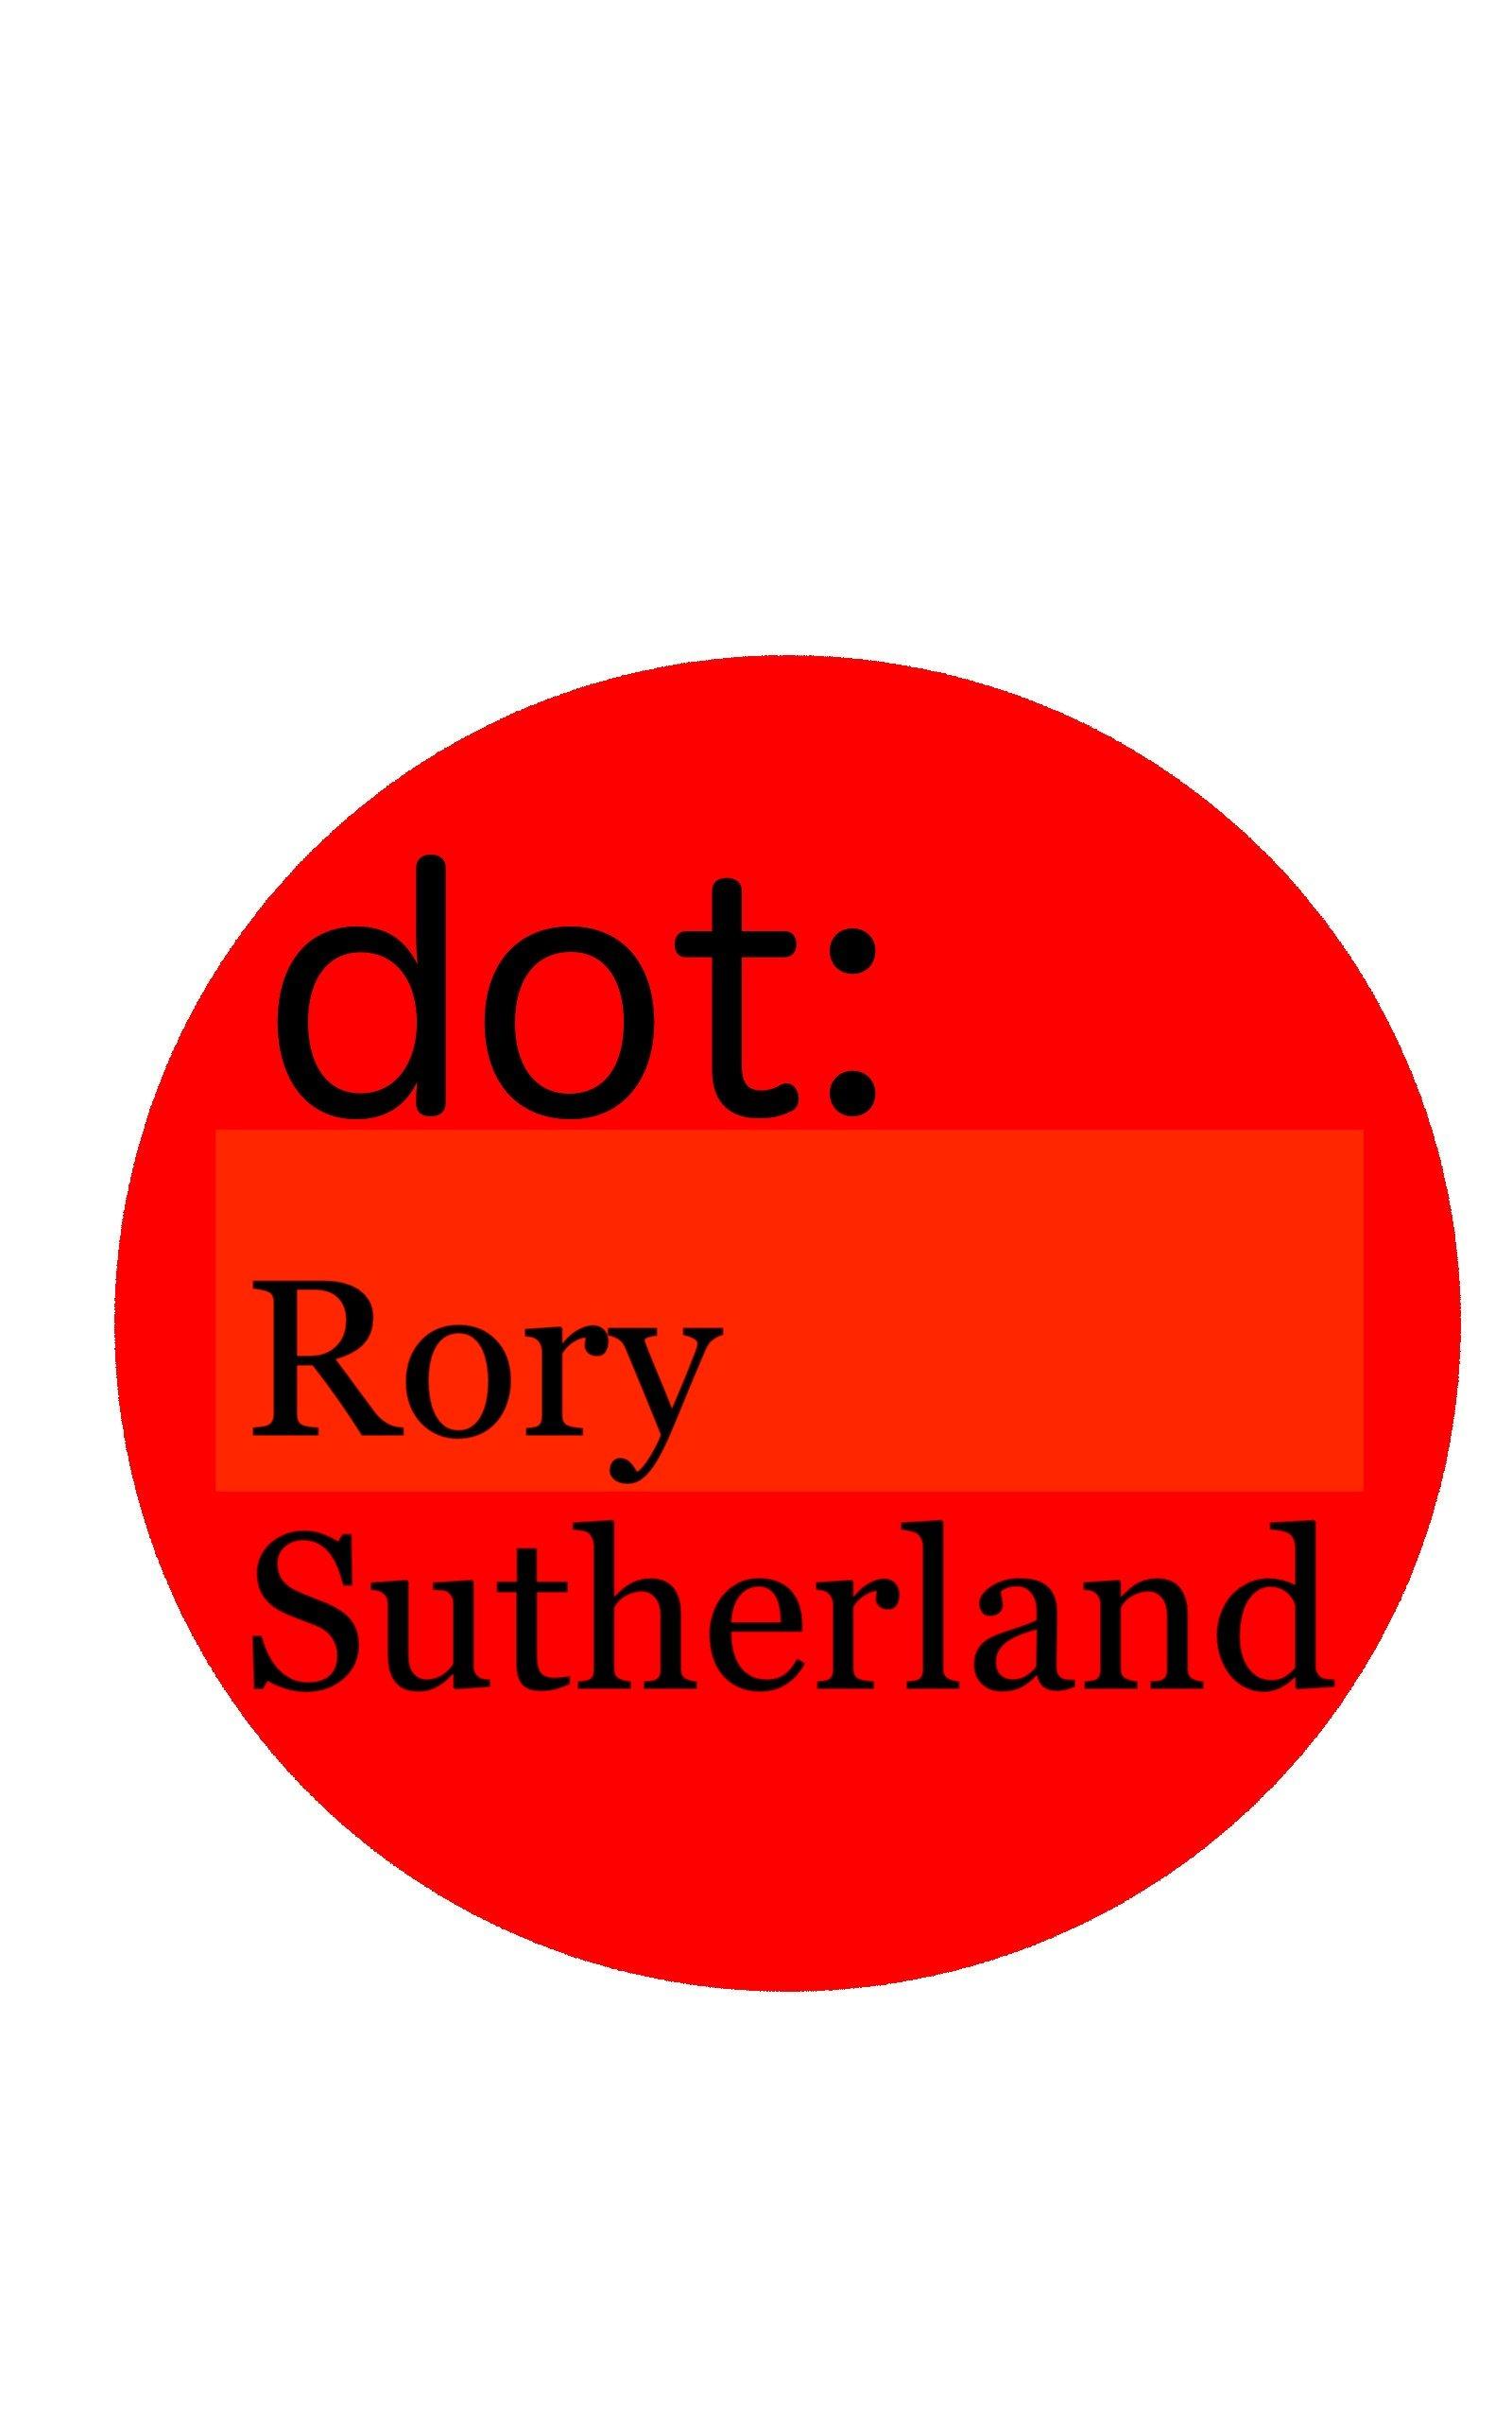 dot: Rory Sutherland: Thinking like a marketing genius